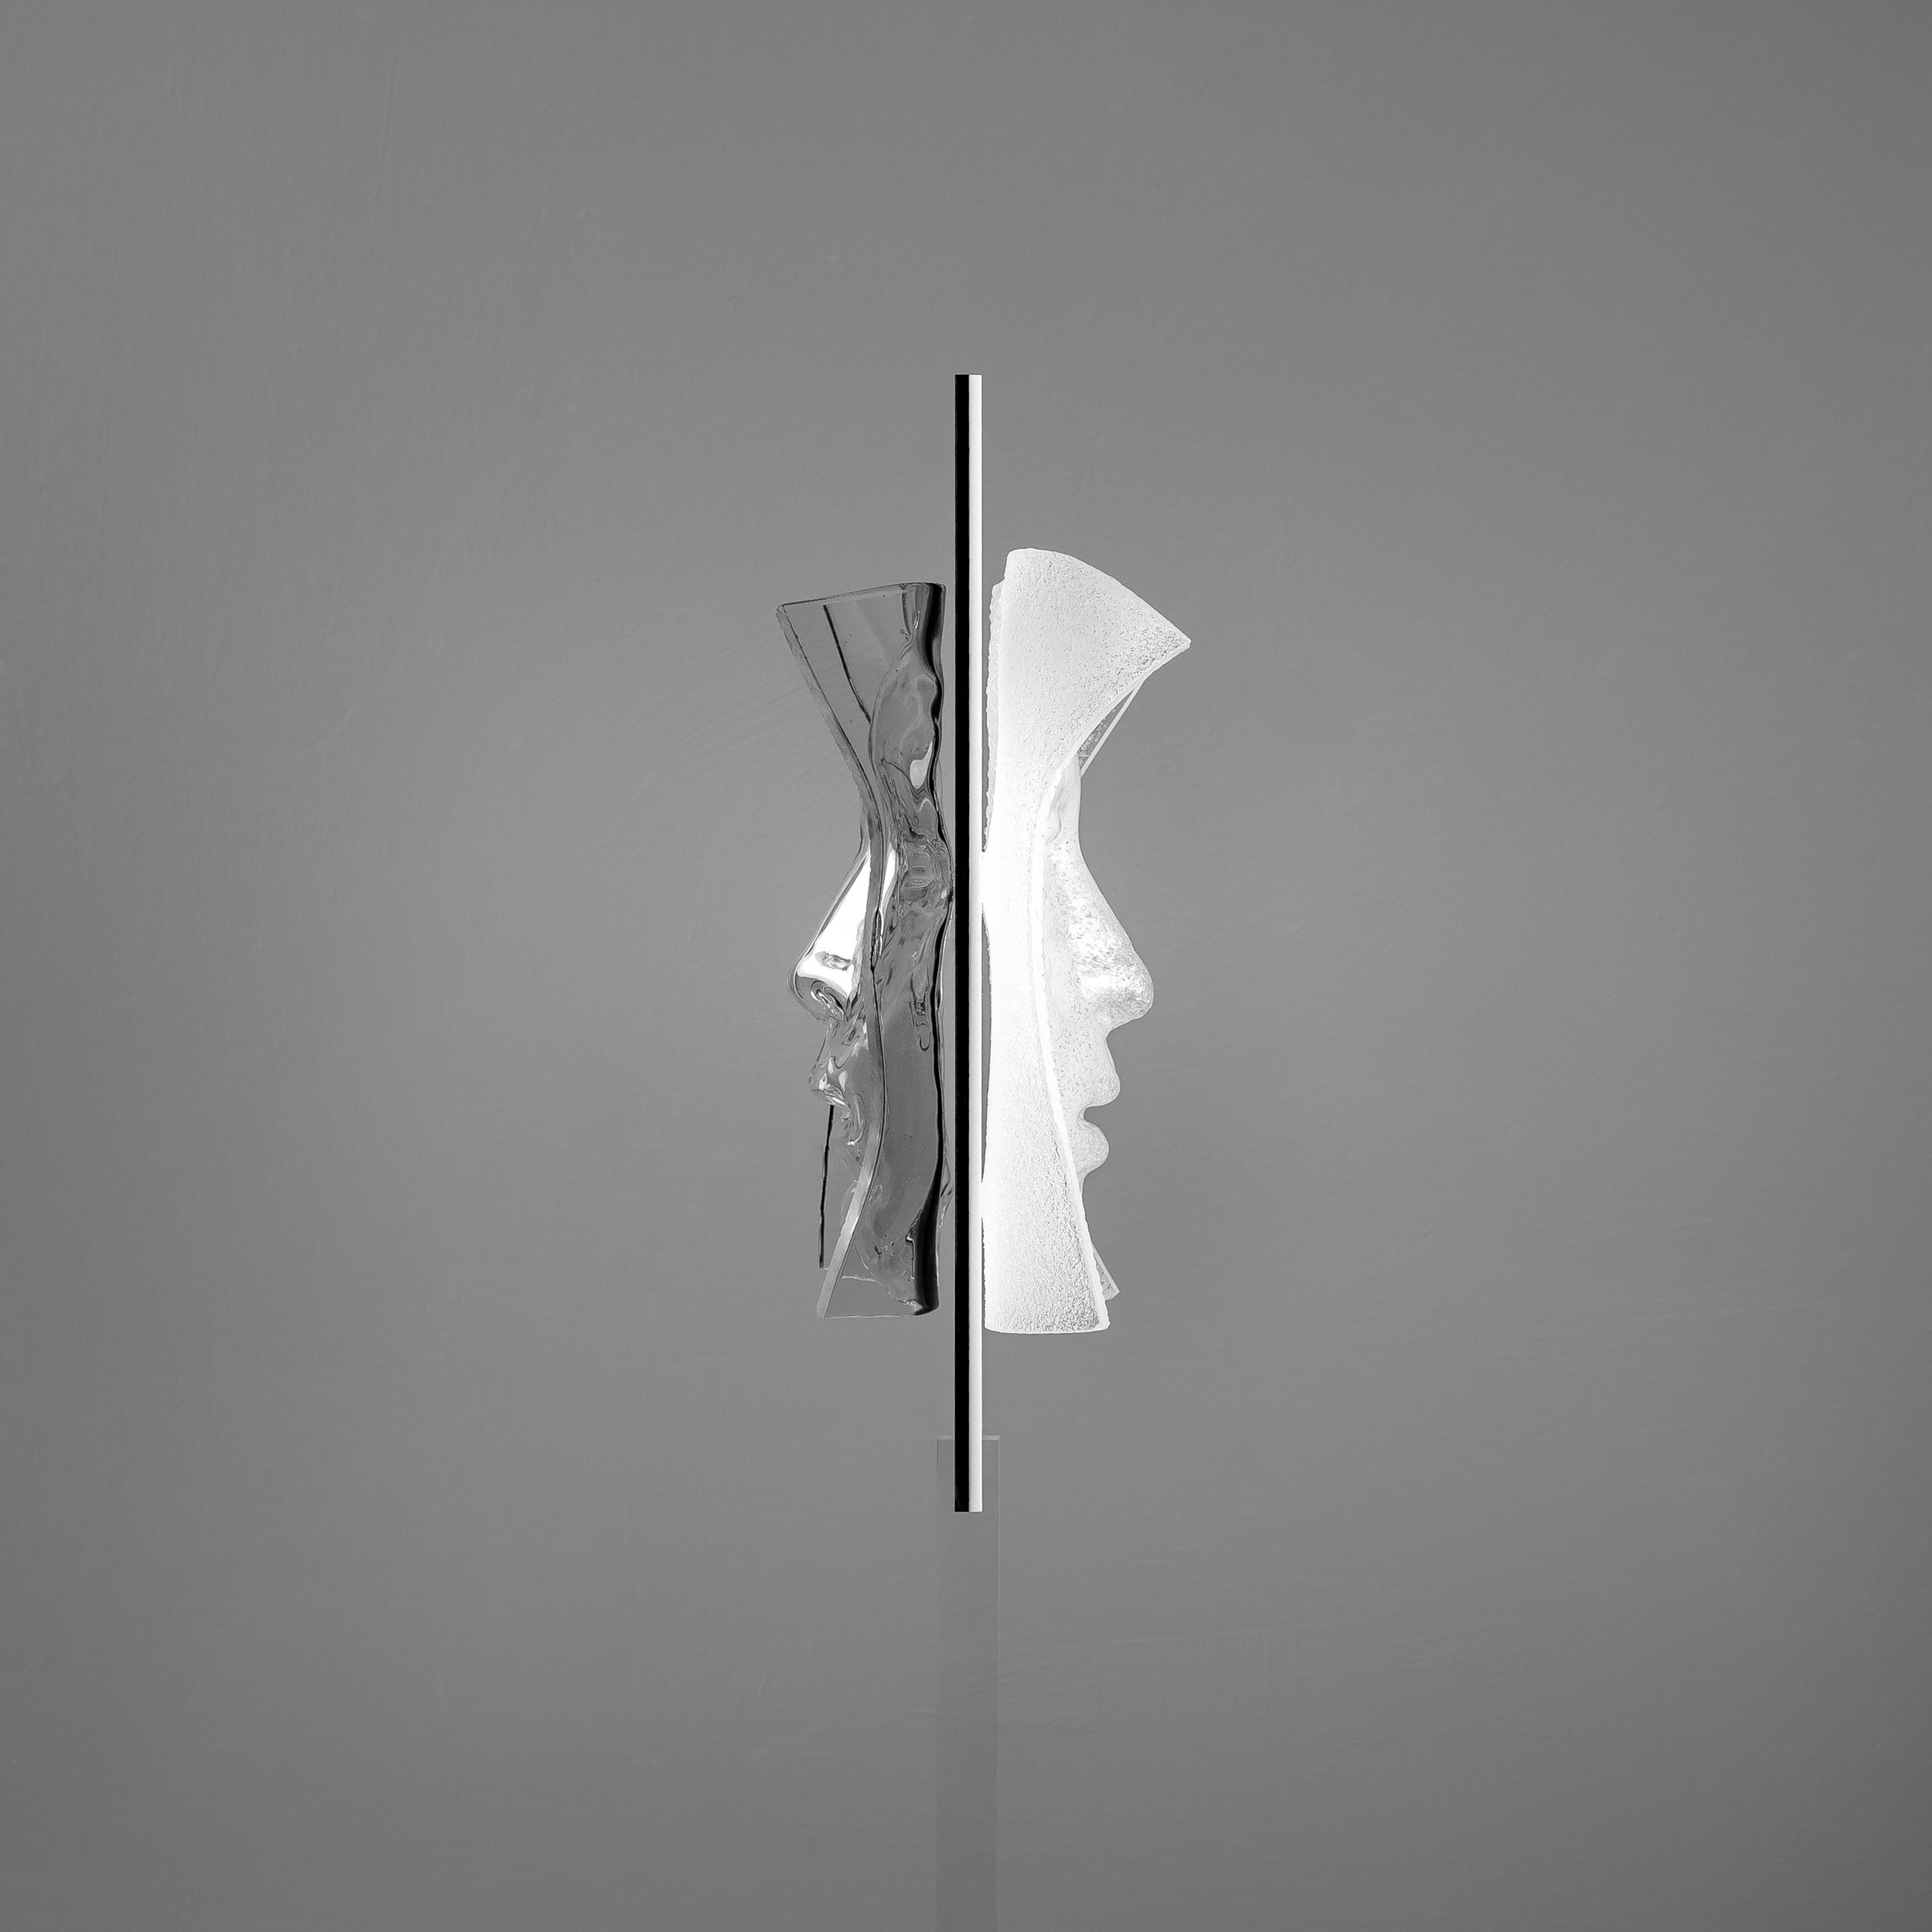 Giano plexiglas trasparente, nero 47x12x25.jpg